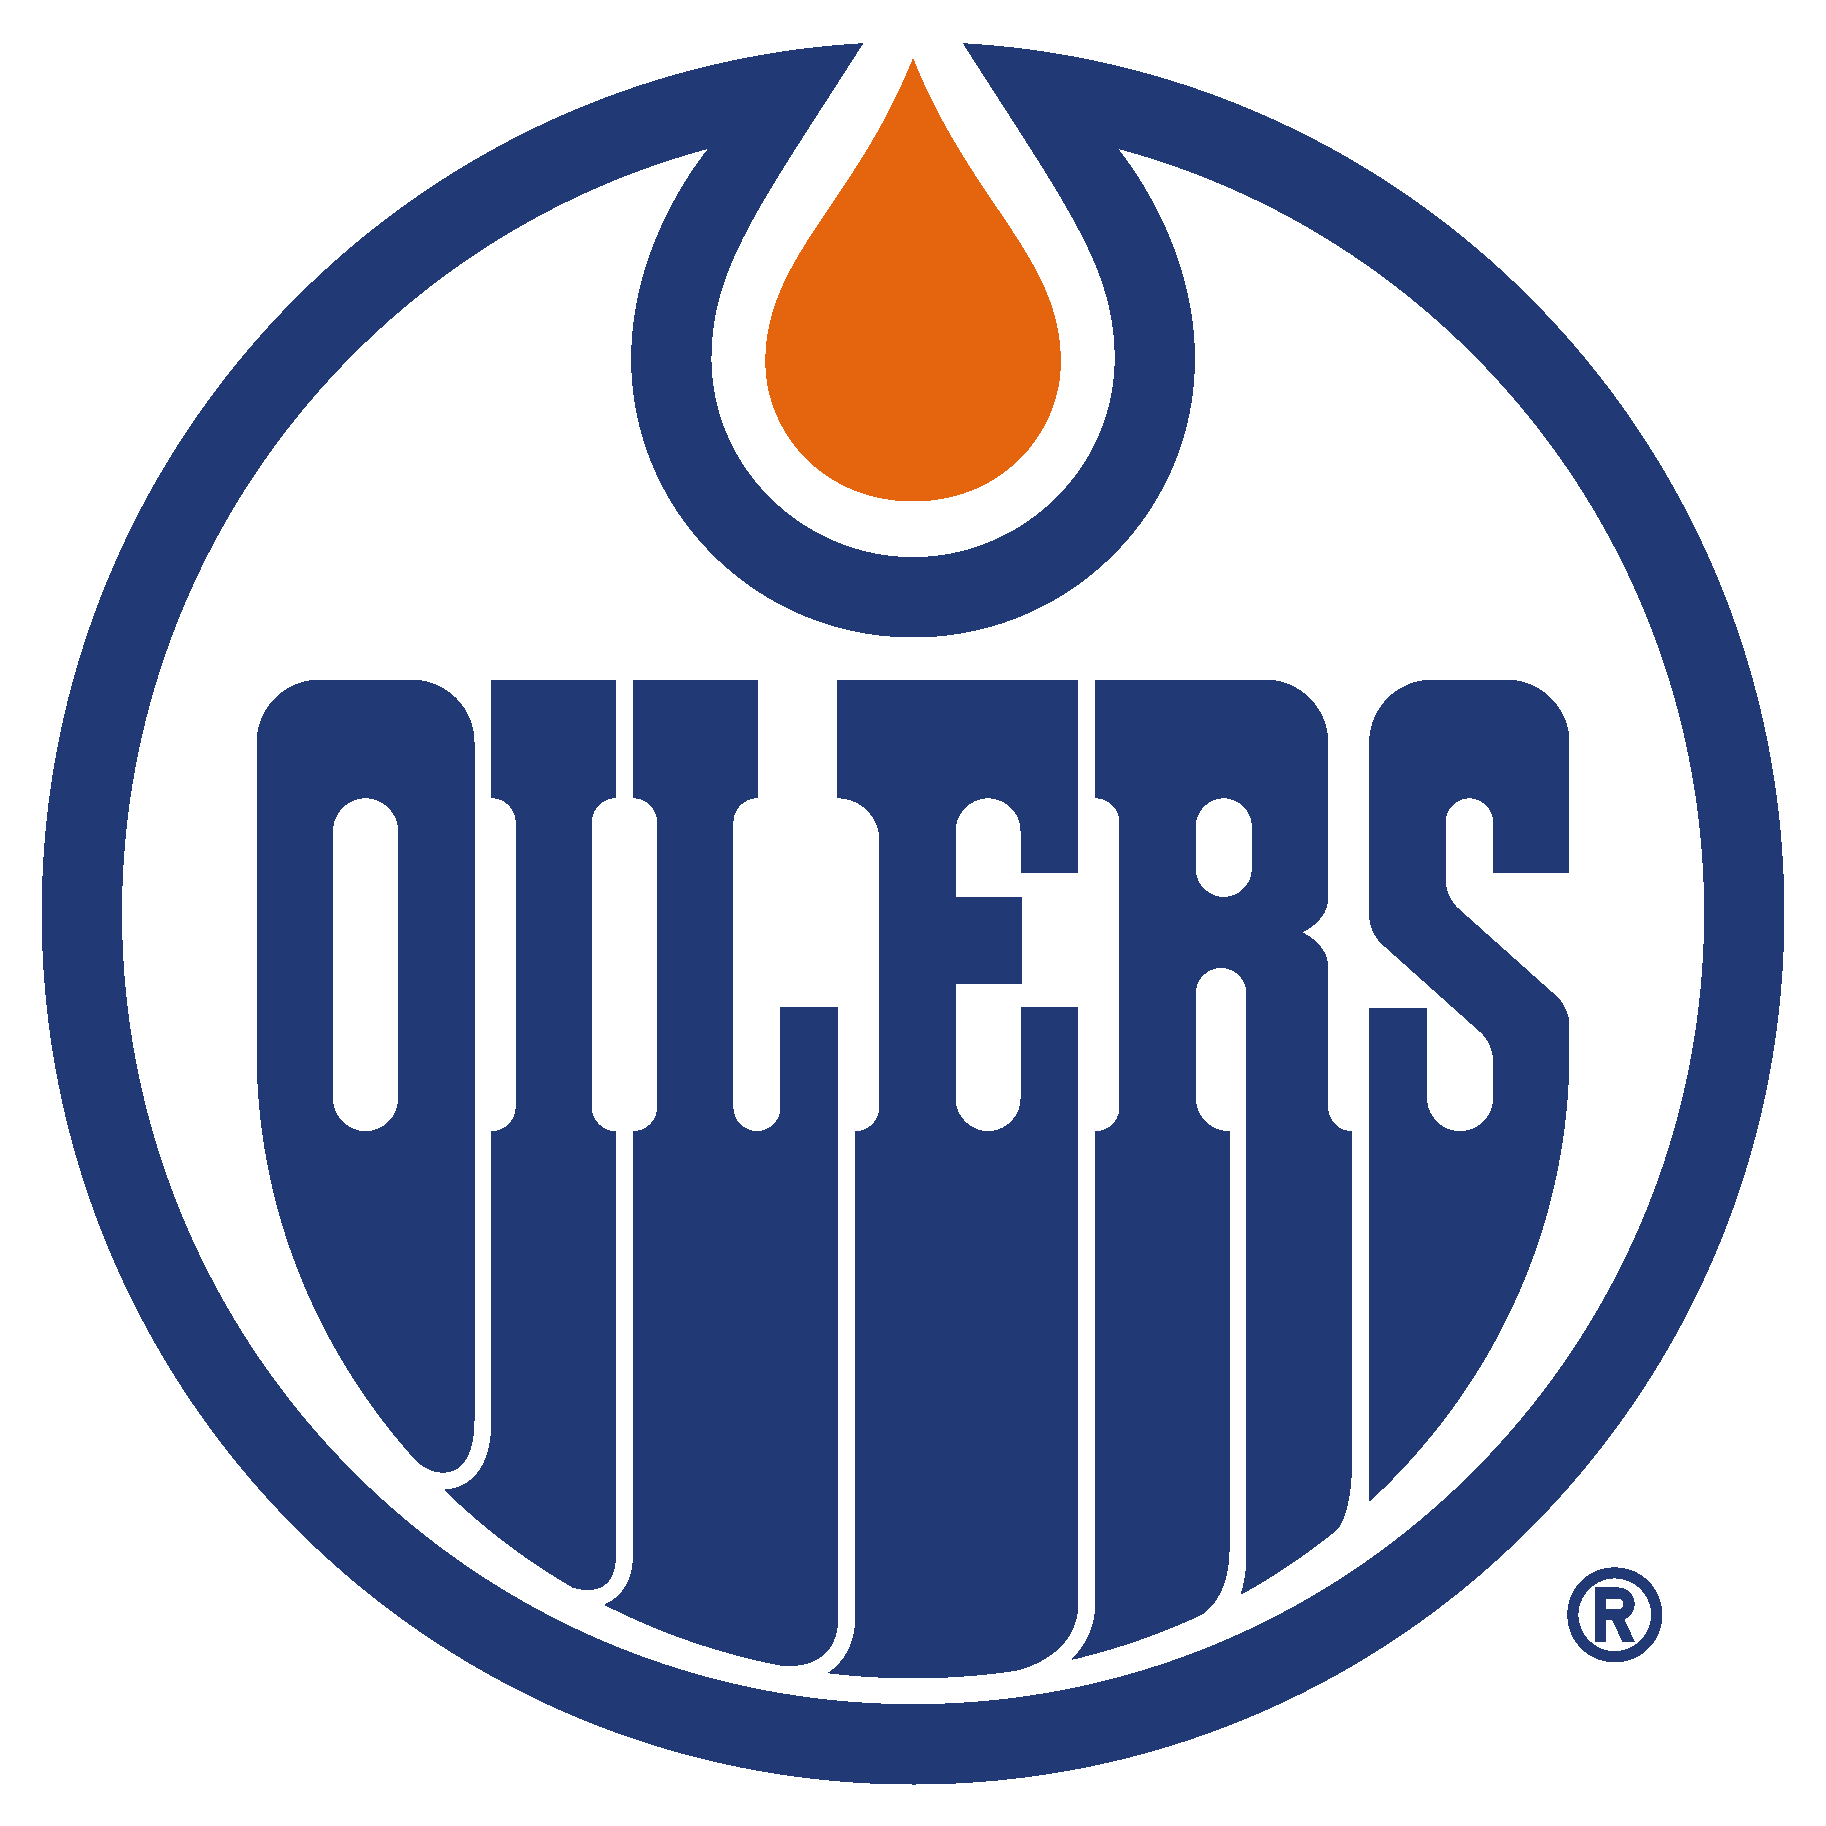 1826x1826 Edmonton Oilers Logo [Eps Nhl] Vector Eps Free Download, Logo